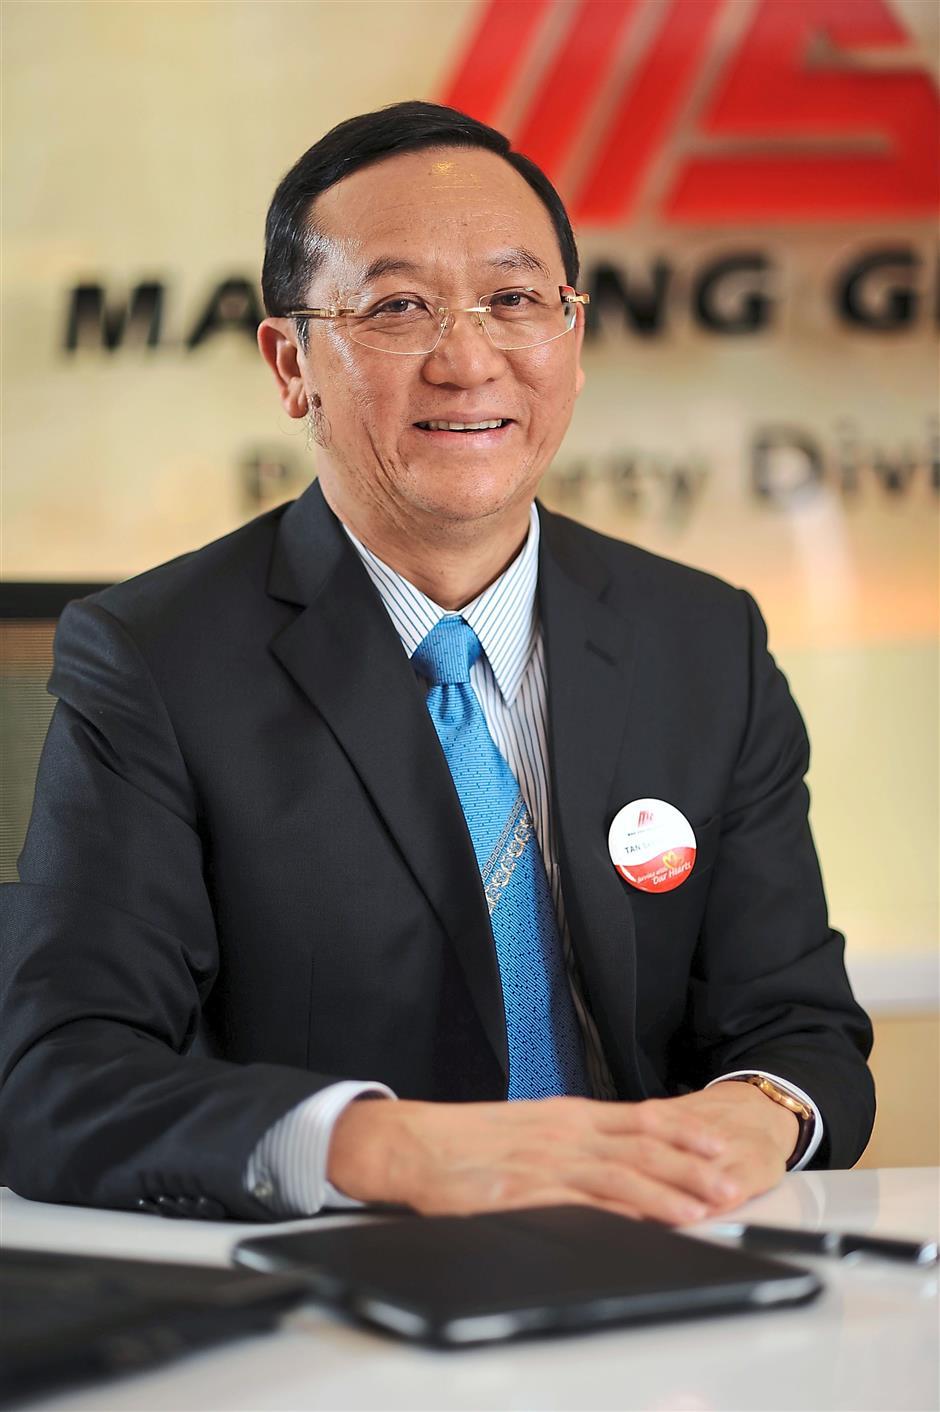 Mah Sing Group Managing Director Tan Sri Leong Hoy Kum.